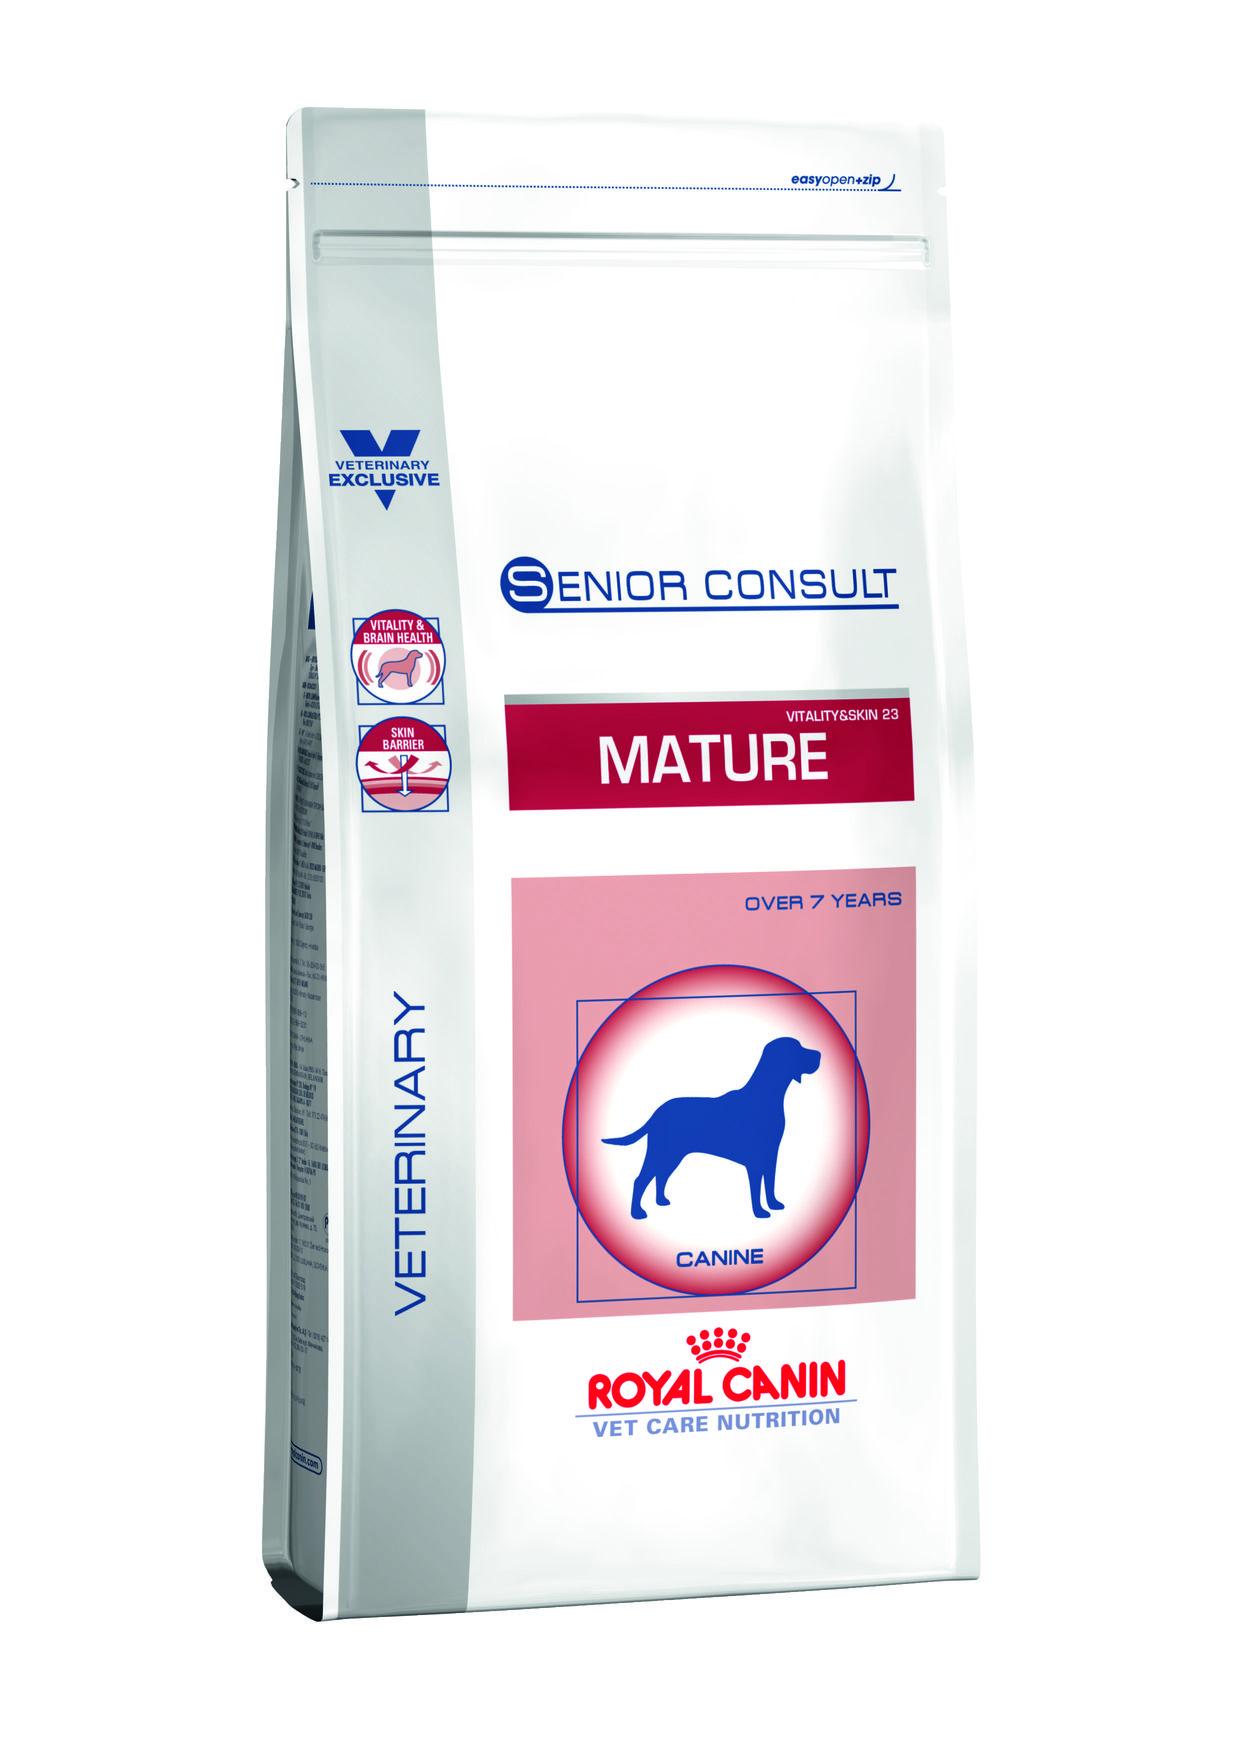 chien veterinaire matur royal canin